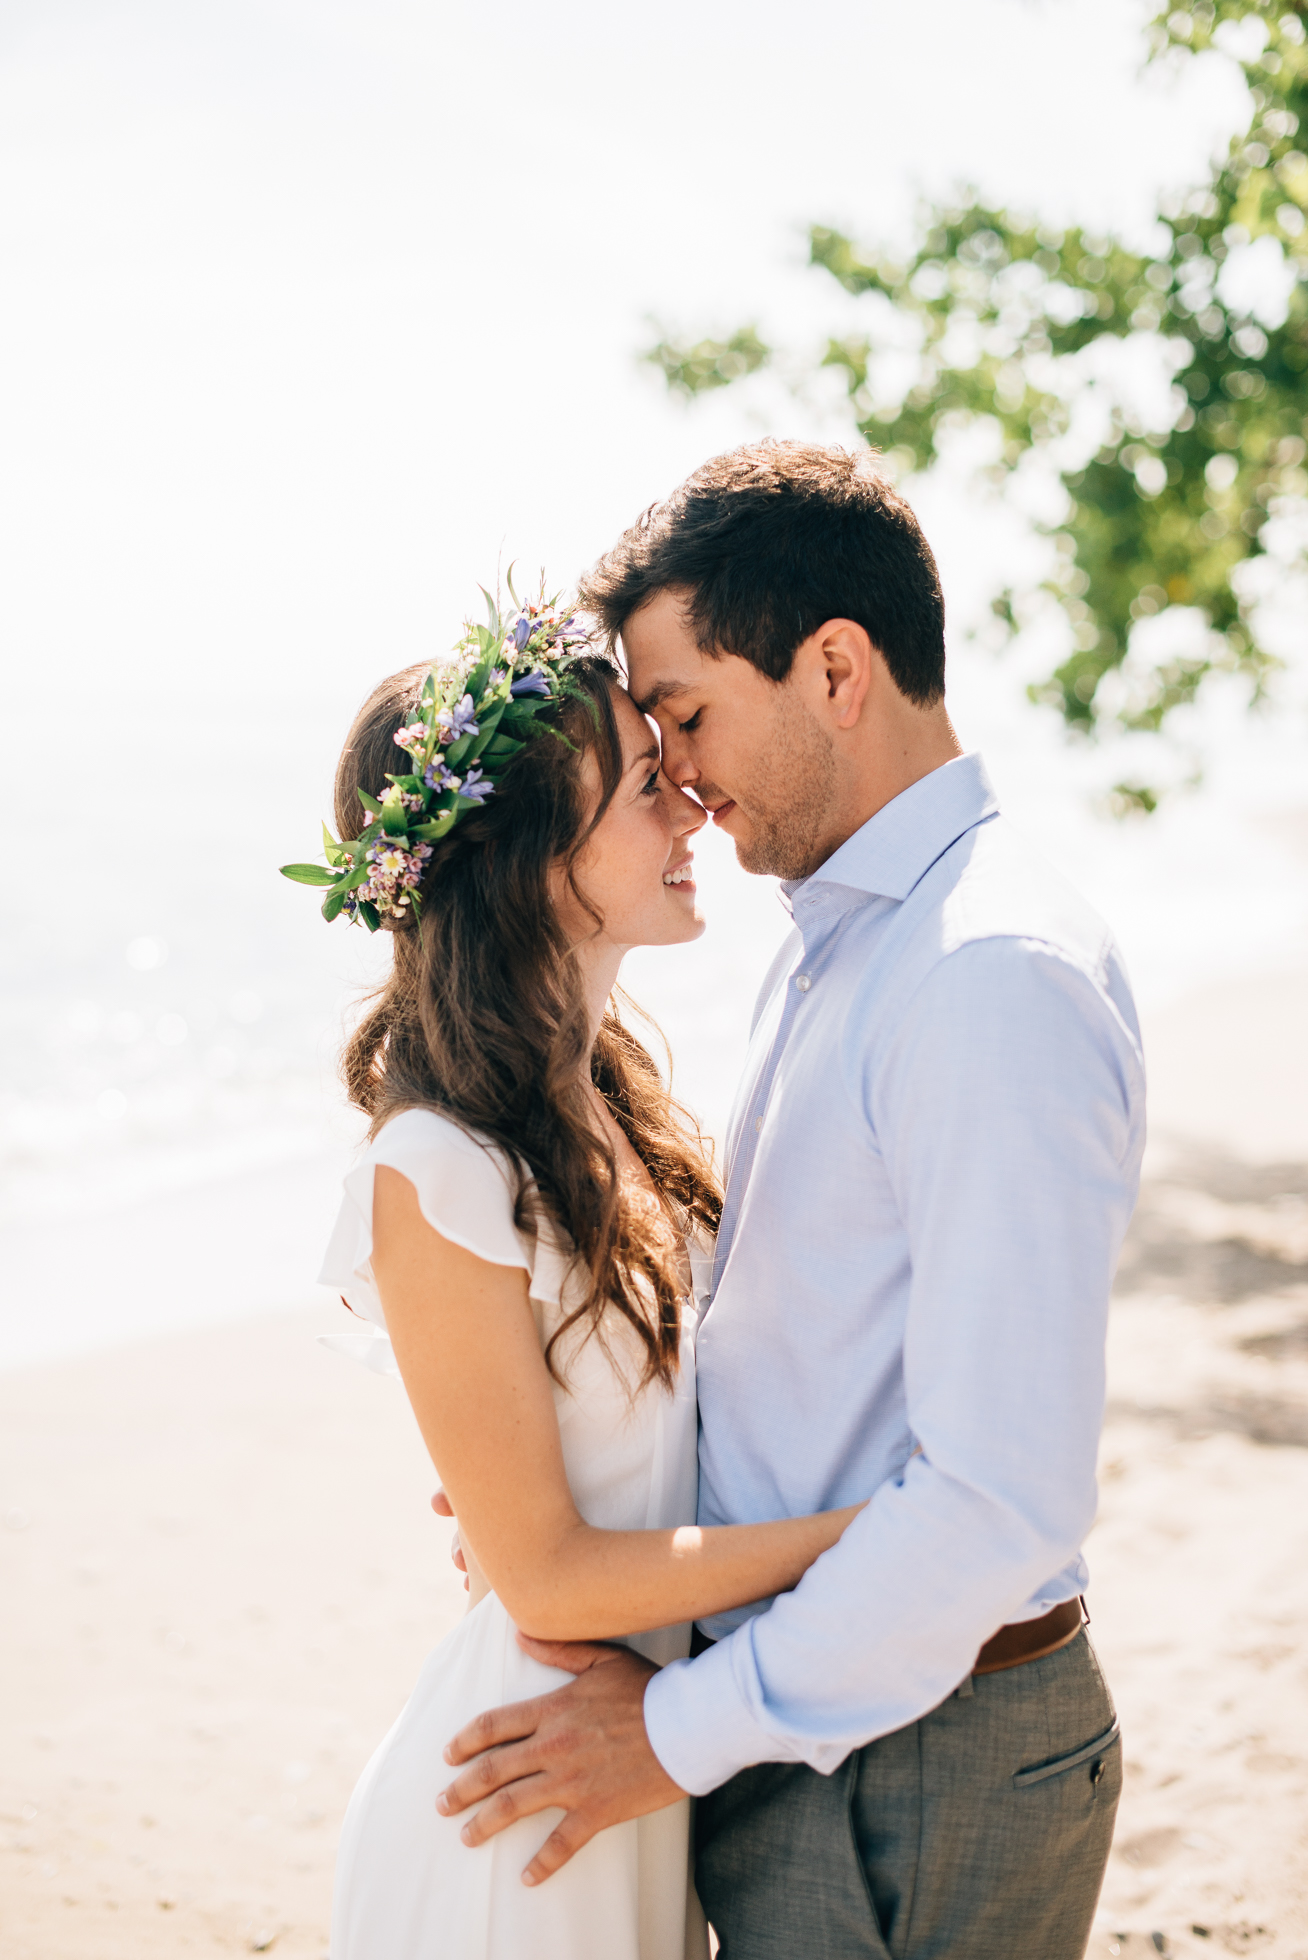 Artscape-Gibraltar-Point-Wedding-Photography031.jpg